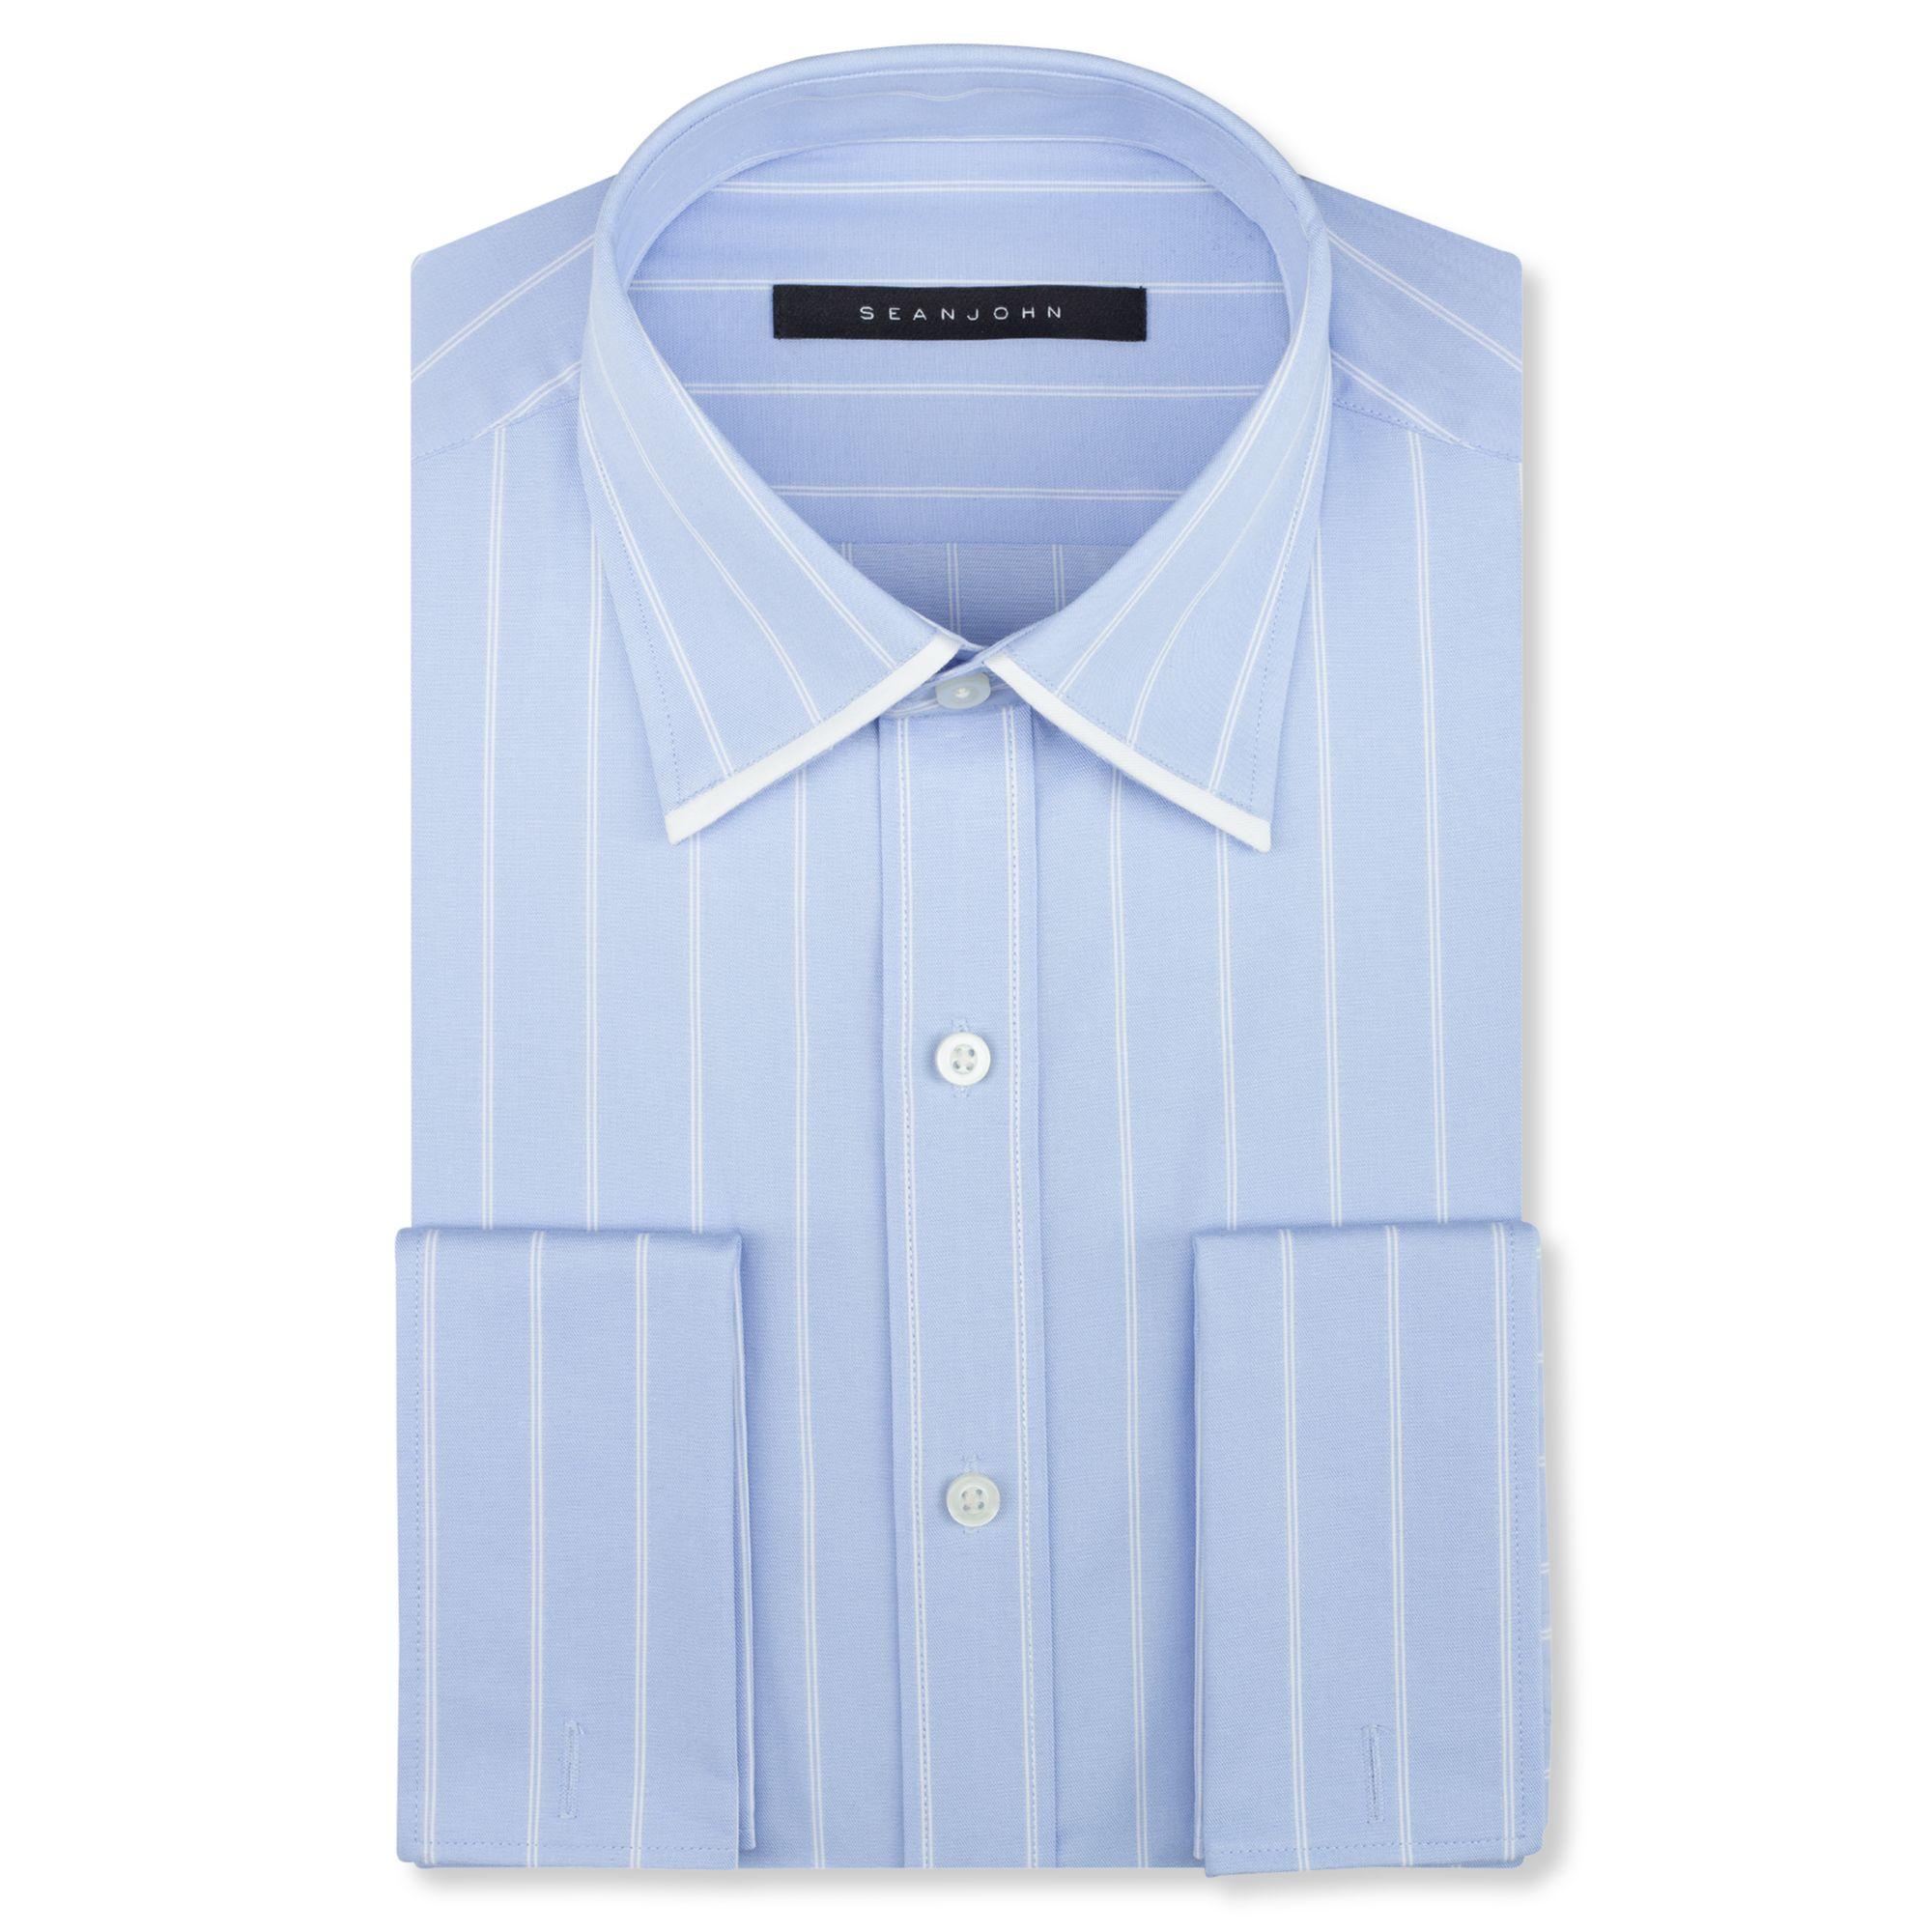 Sean john big and tall sky blue stripe french cuff shirt for Big and tall french cuff dress shirts